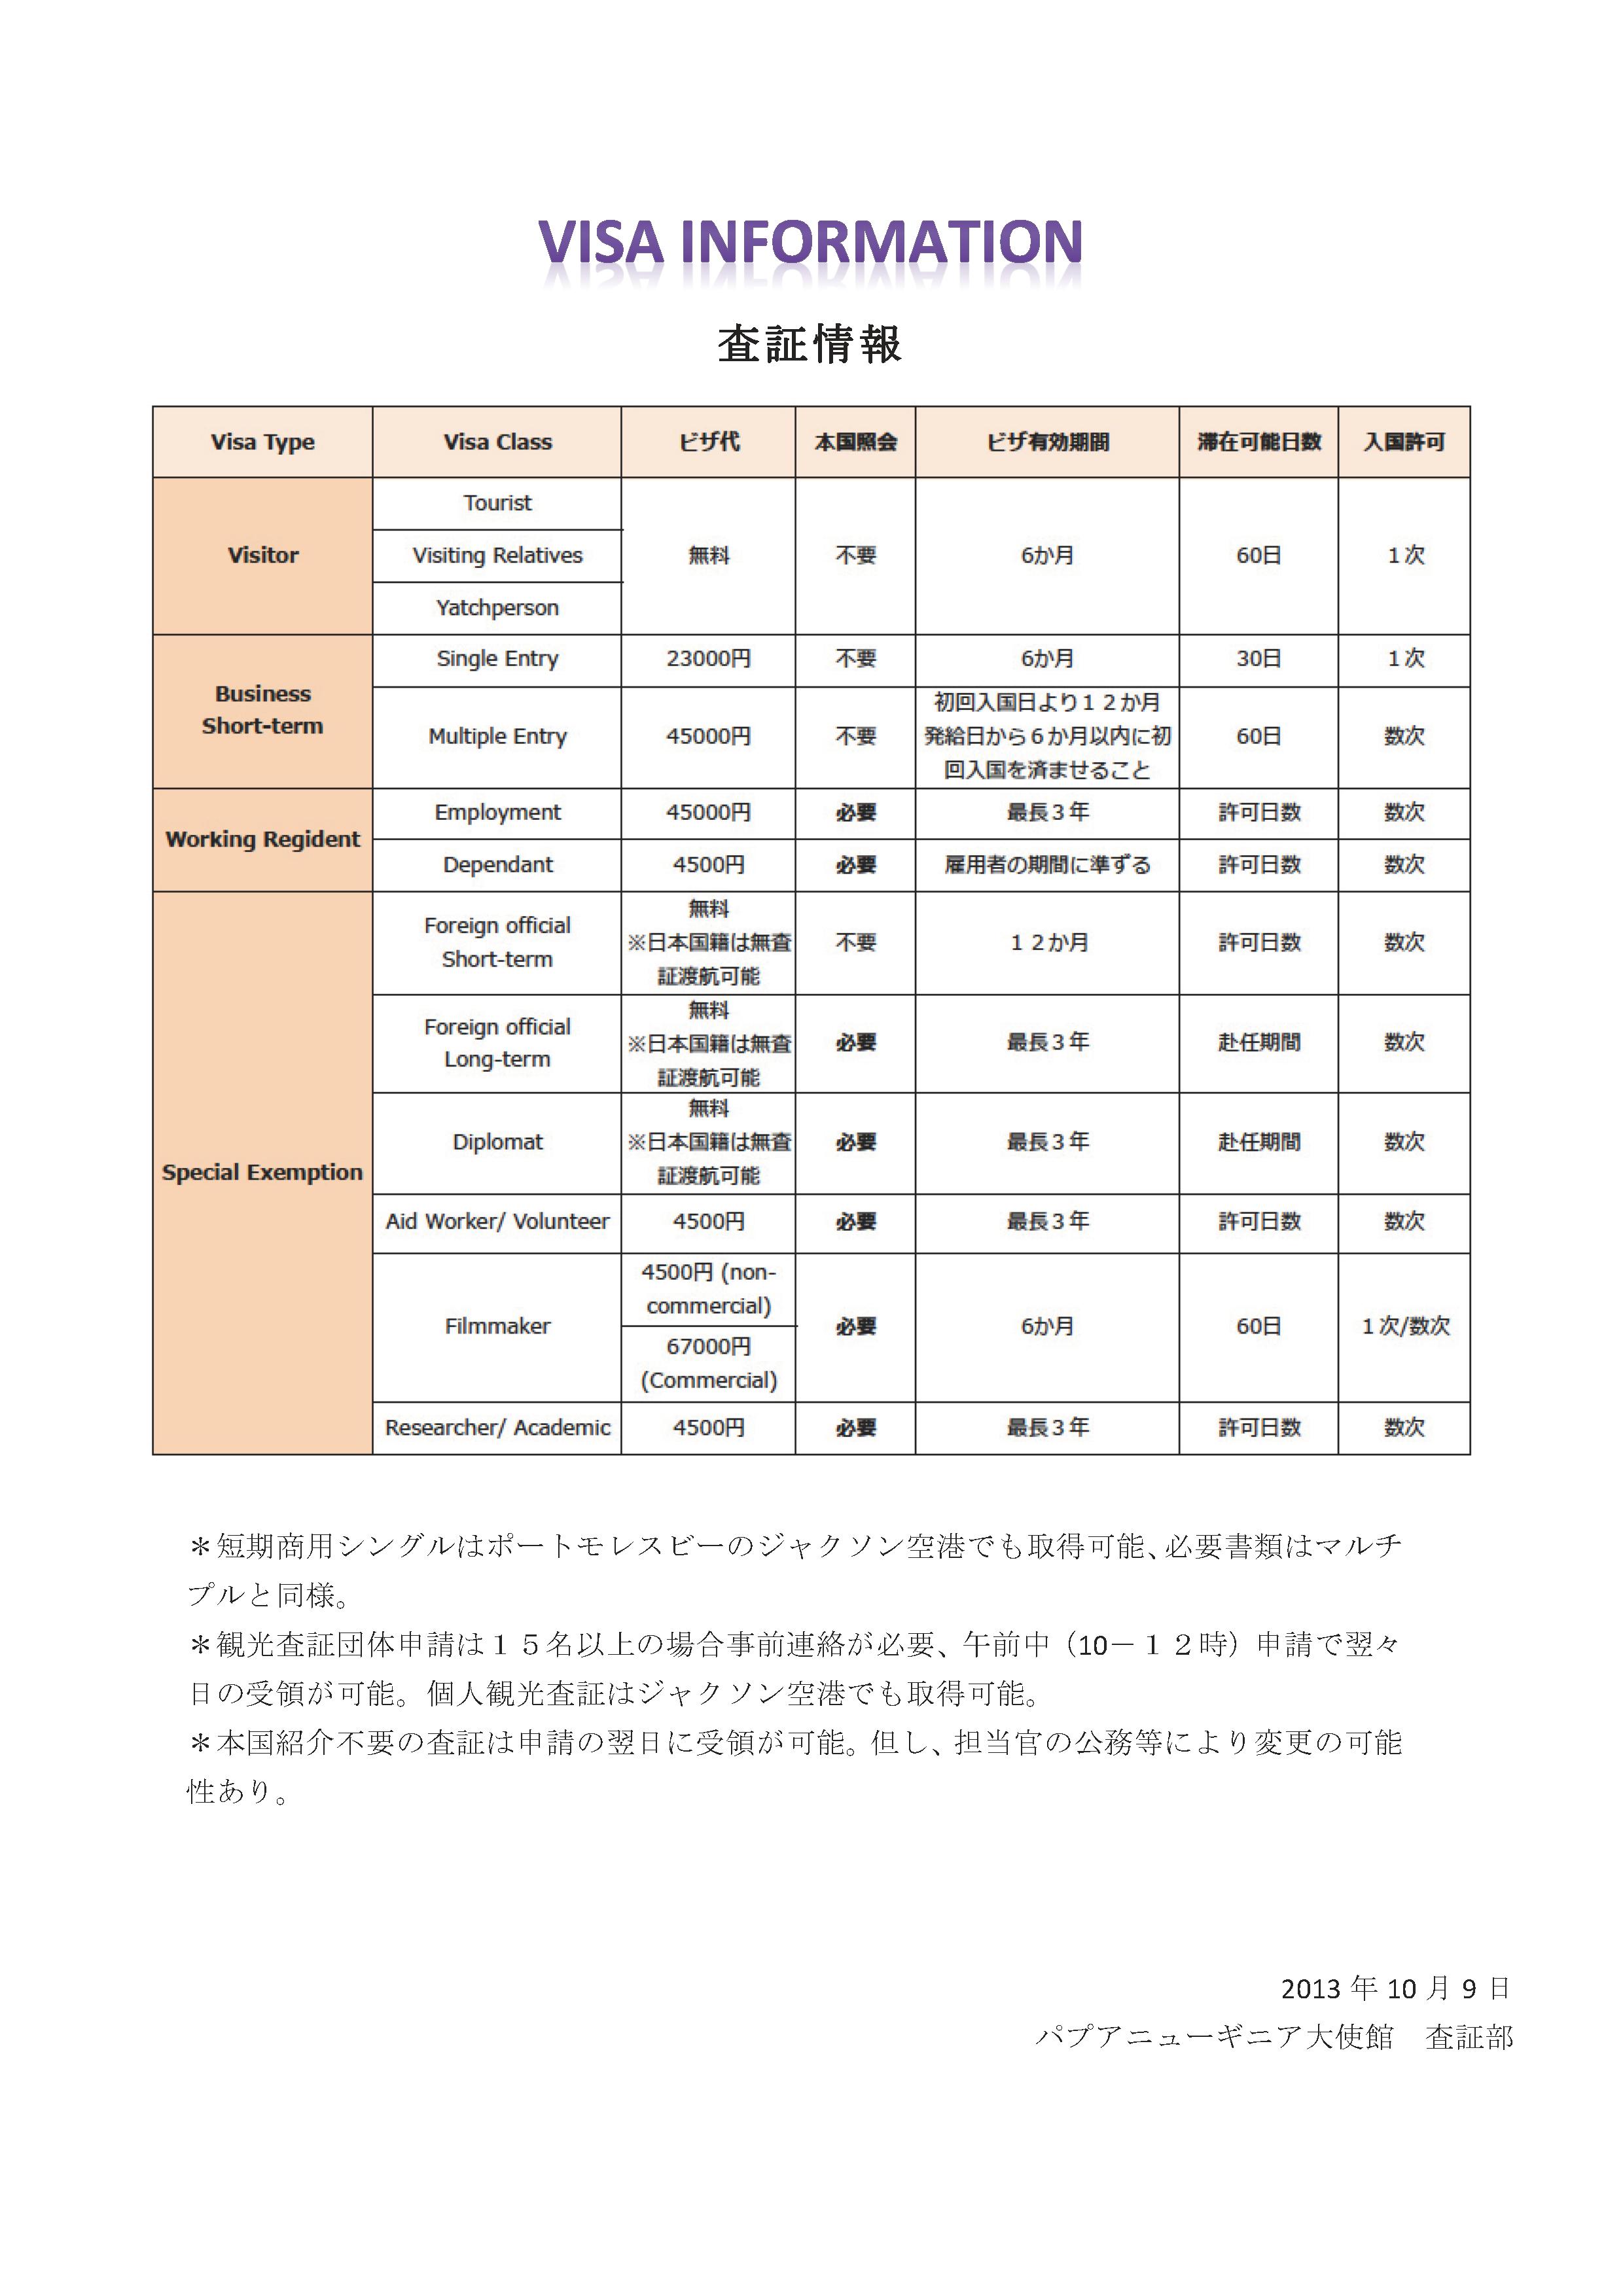 Visa Informationnew